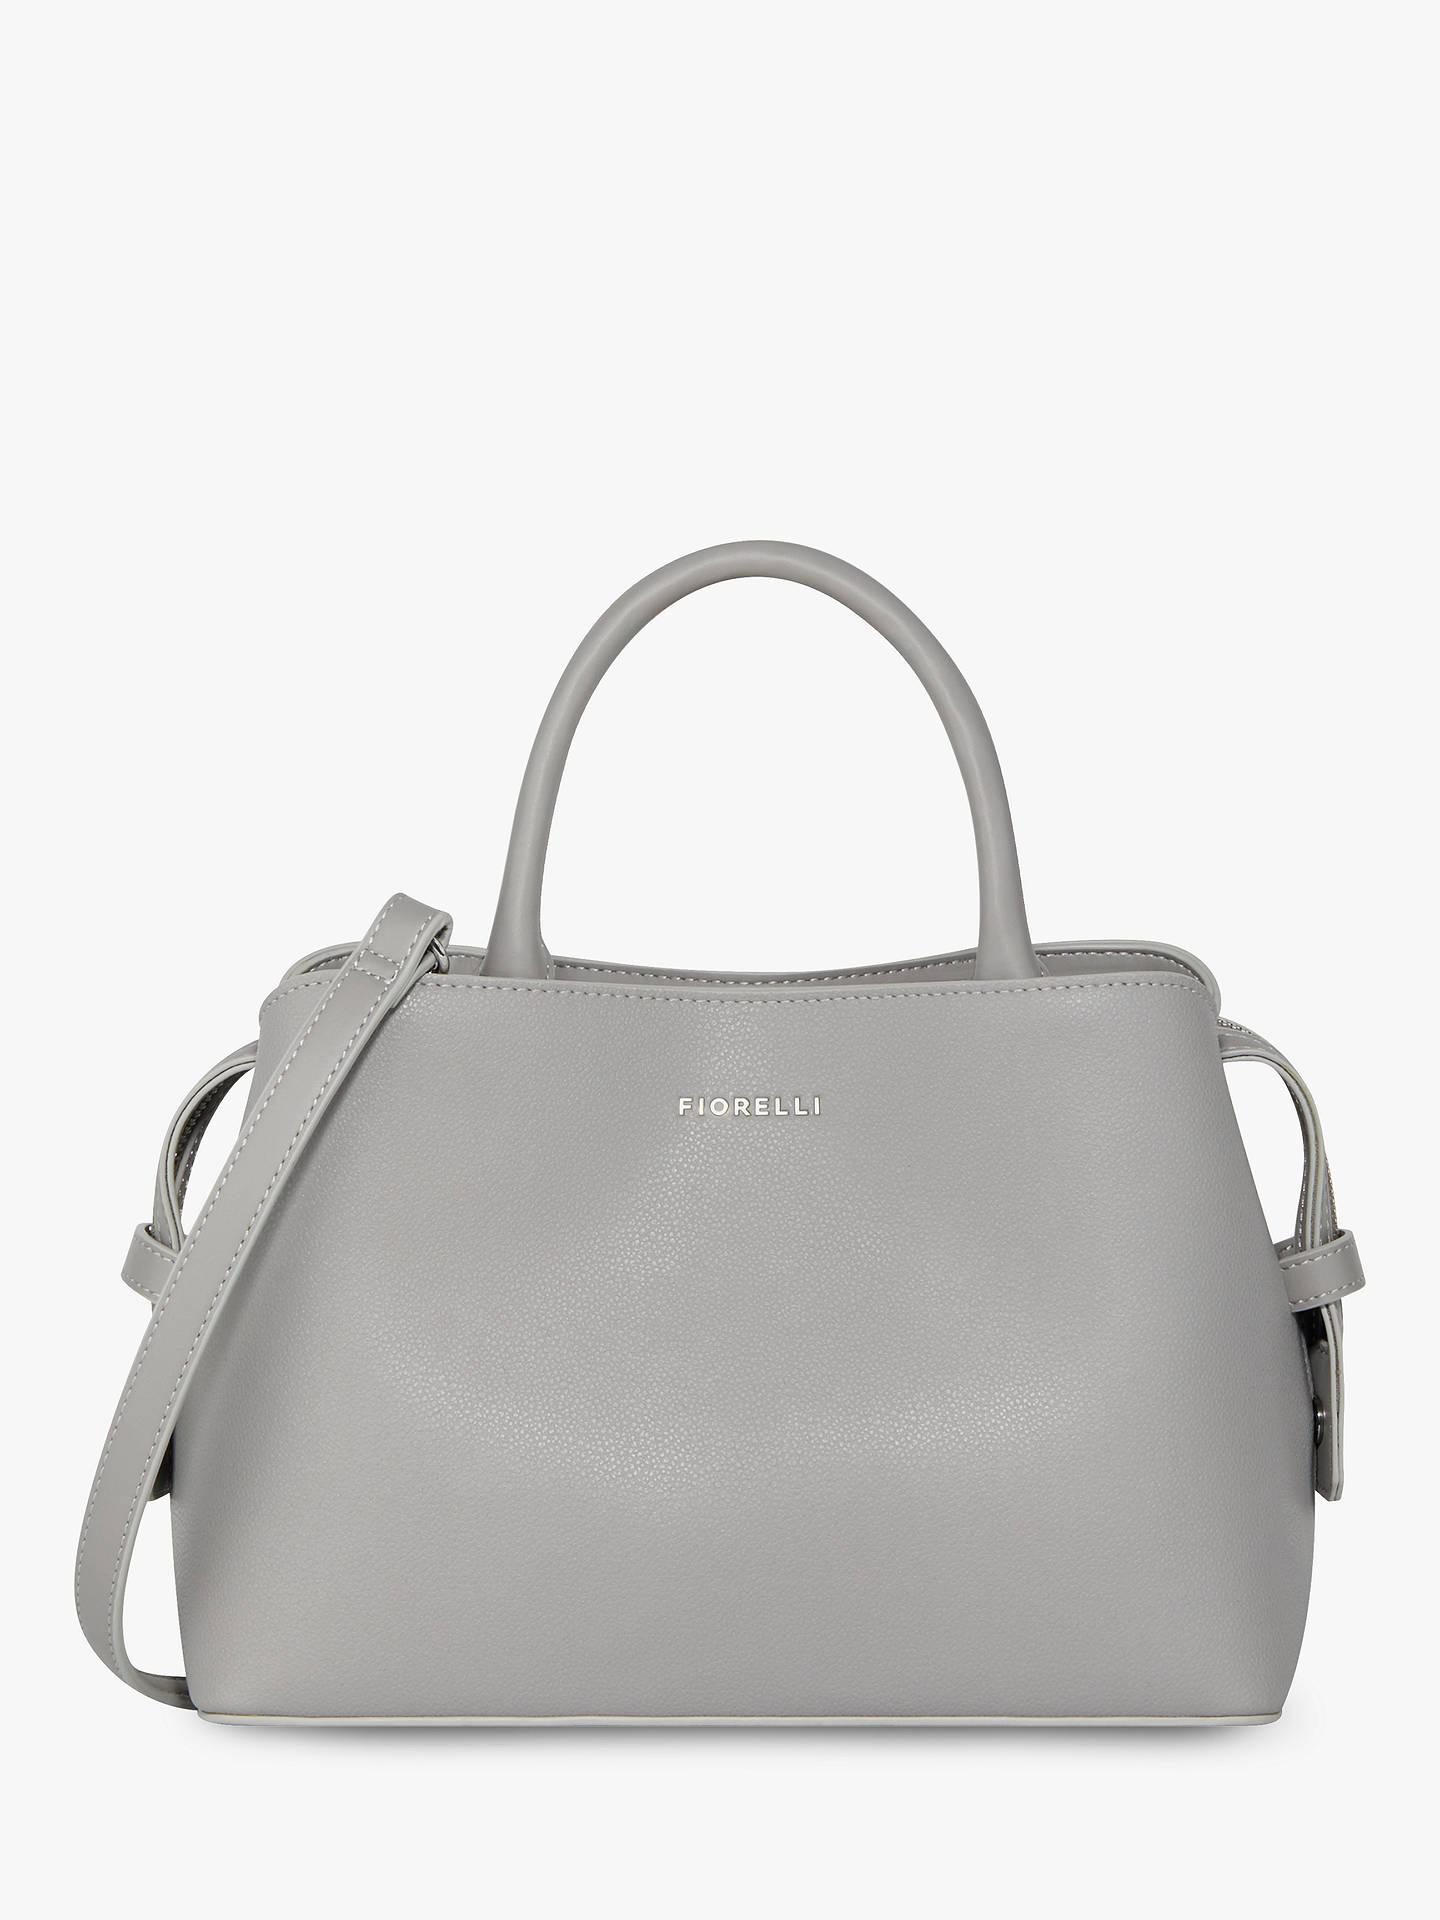 504299b6baf6 Buy Fiorelli Bethnal Triple Compartment Mini Grab Bag, Steel Online at  johnlewis.com ...